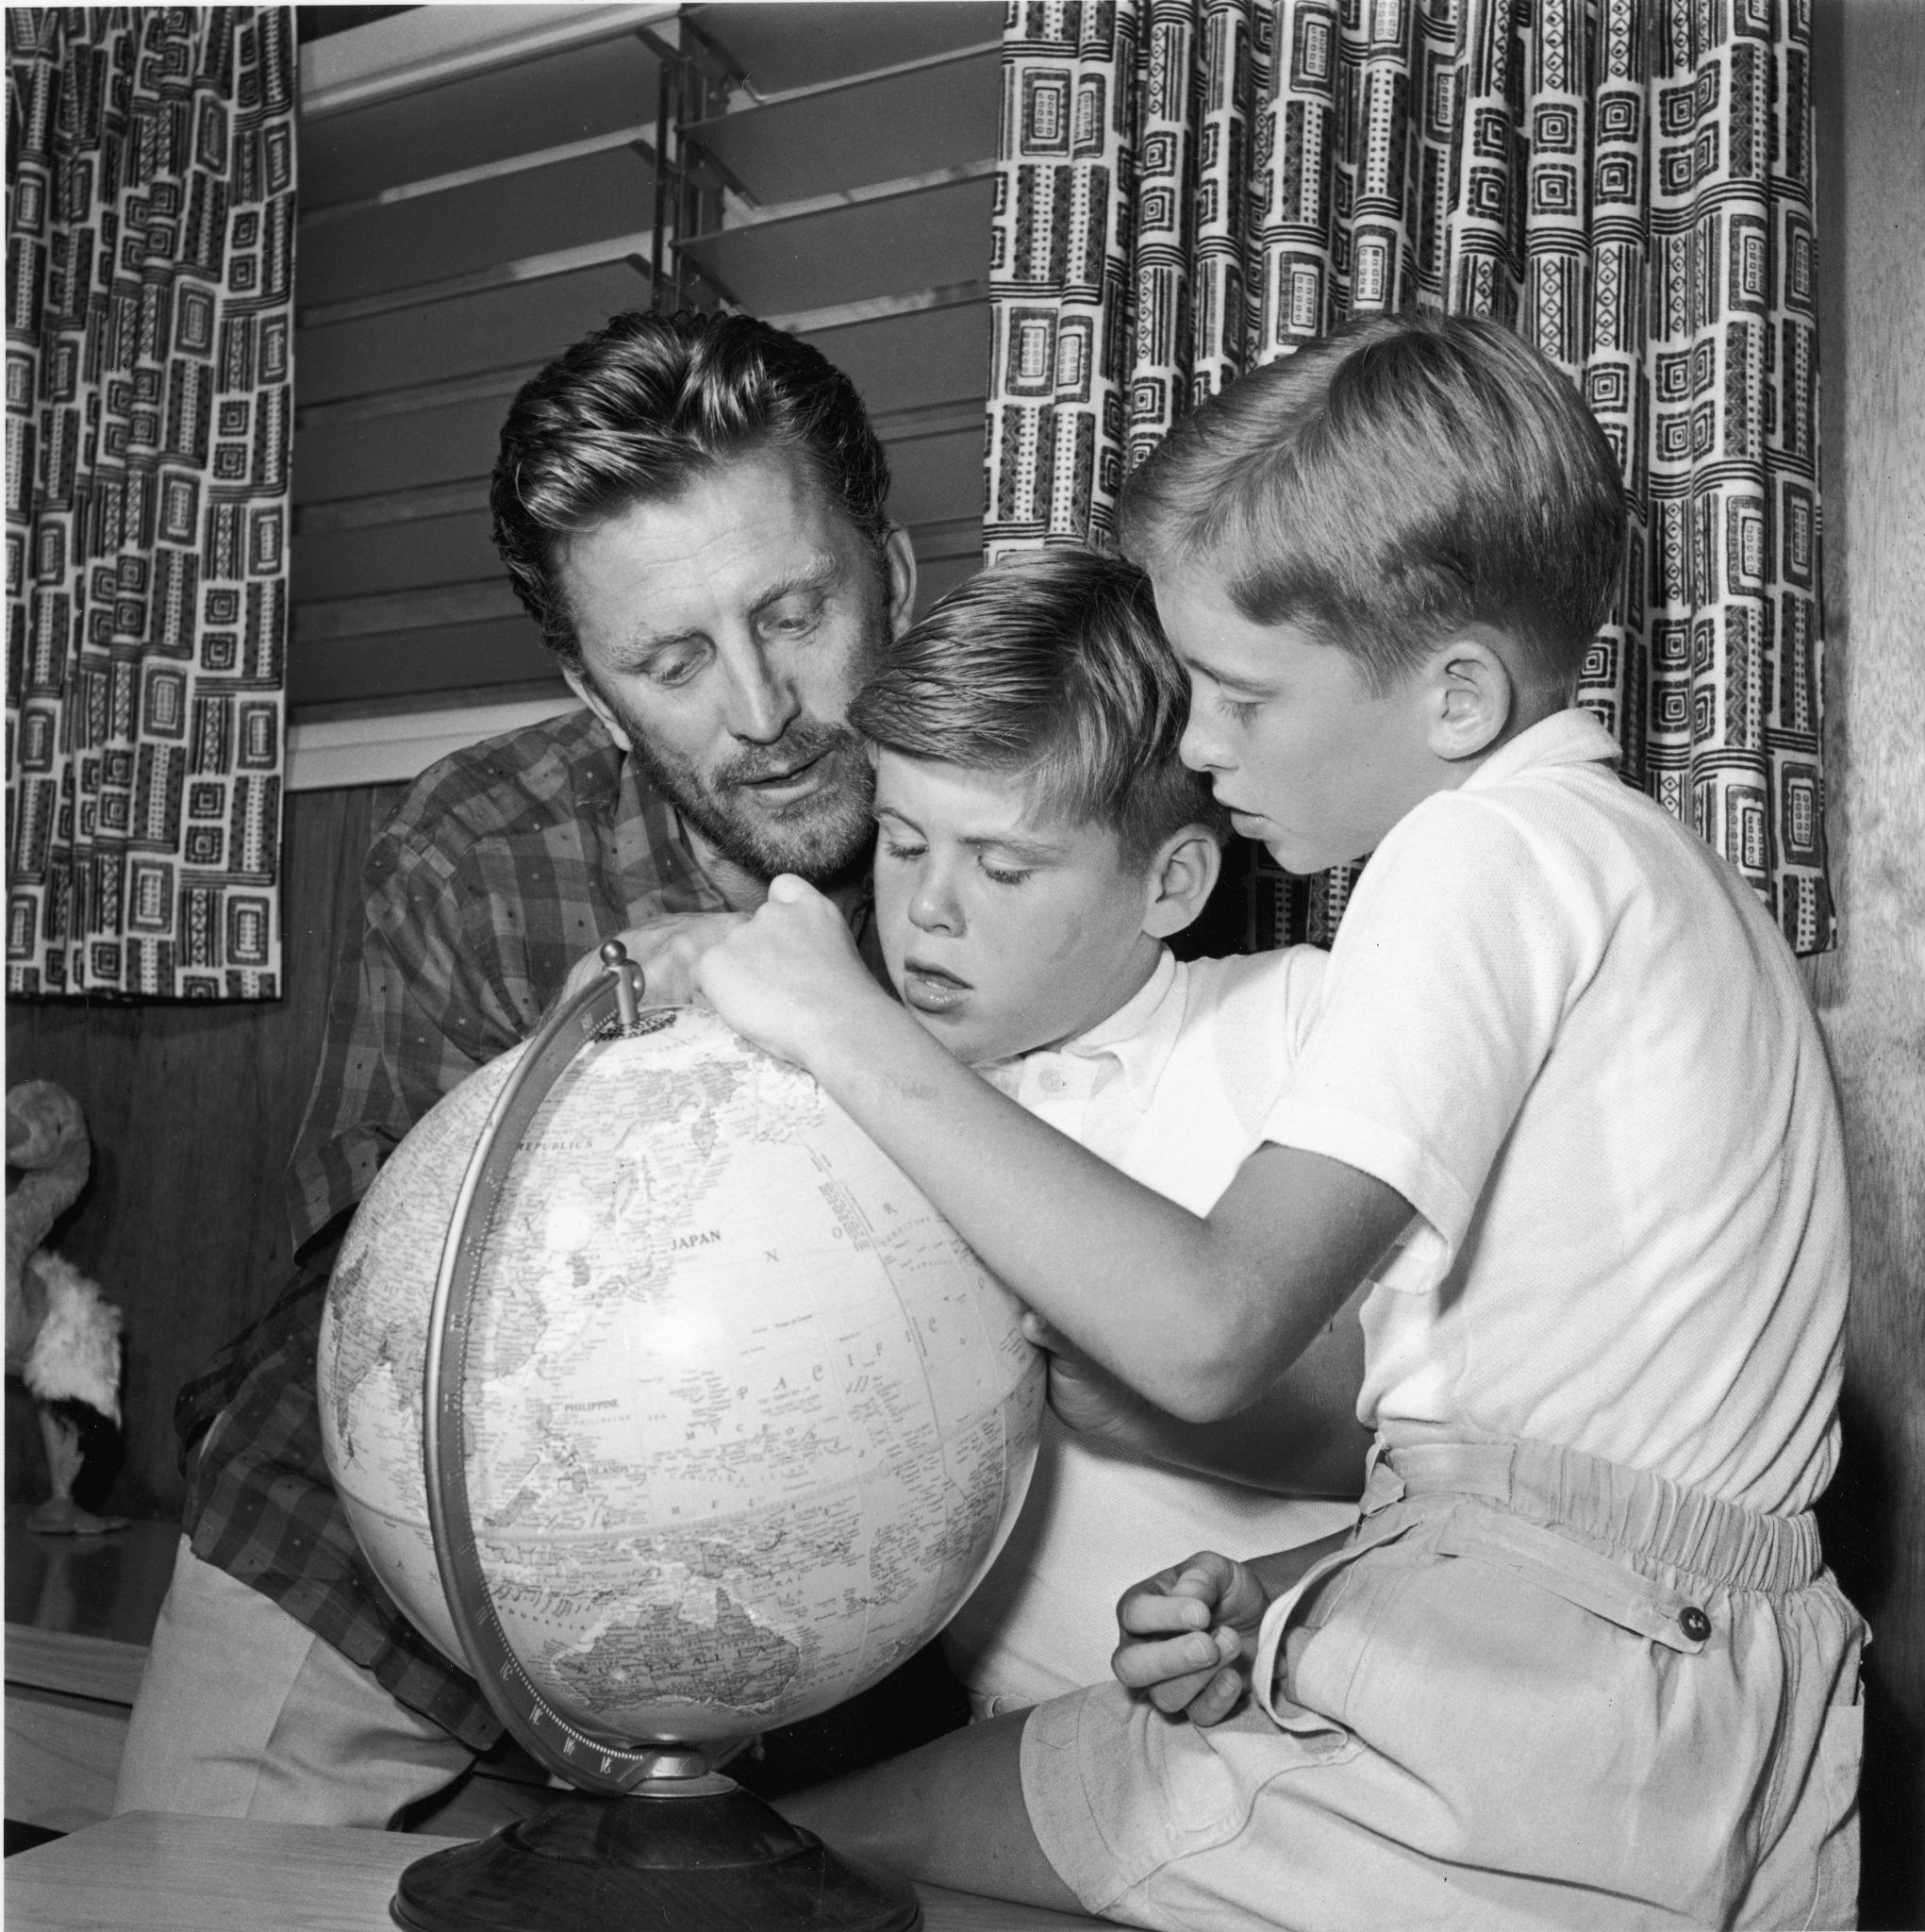 kirk douglas and sons joel and michael